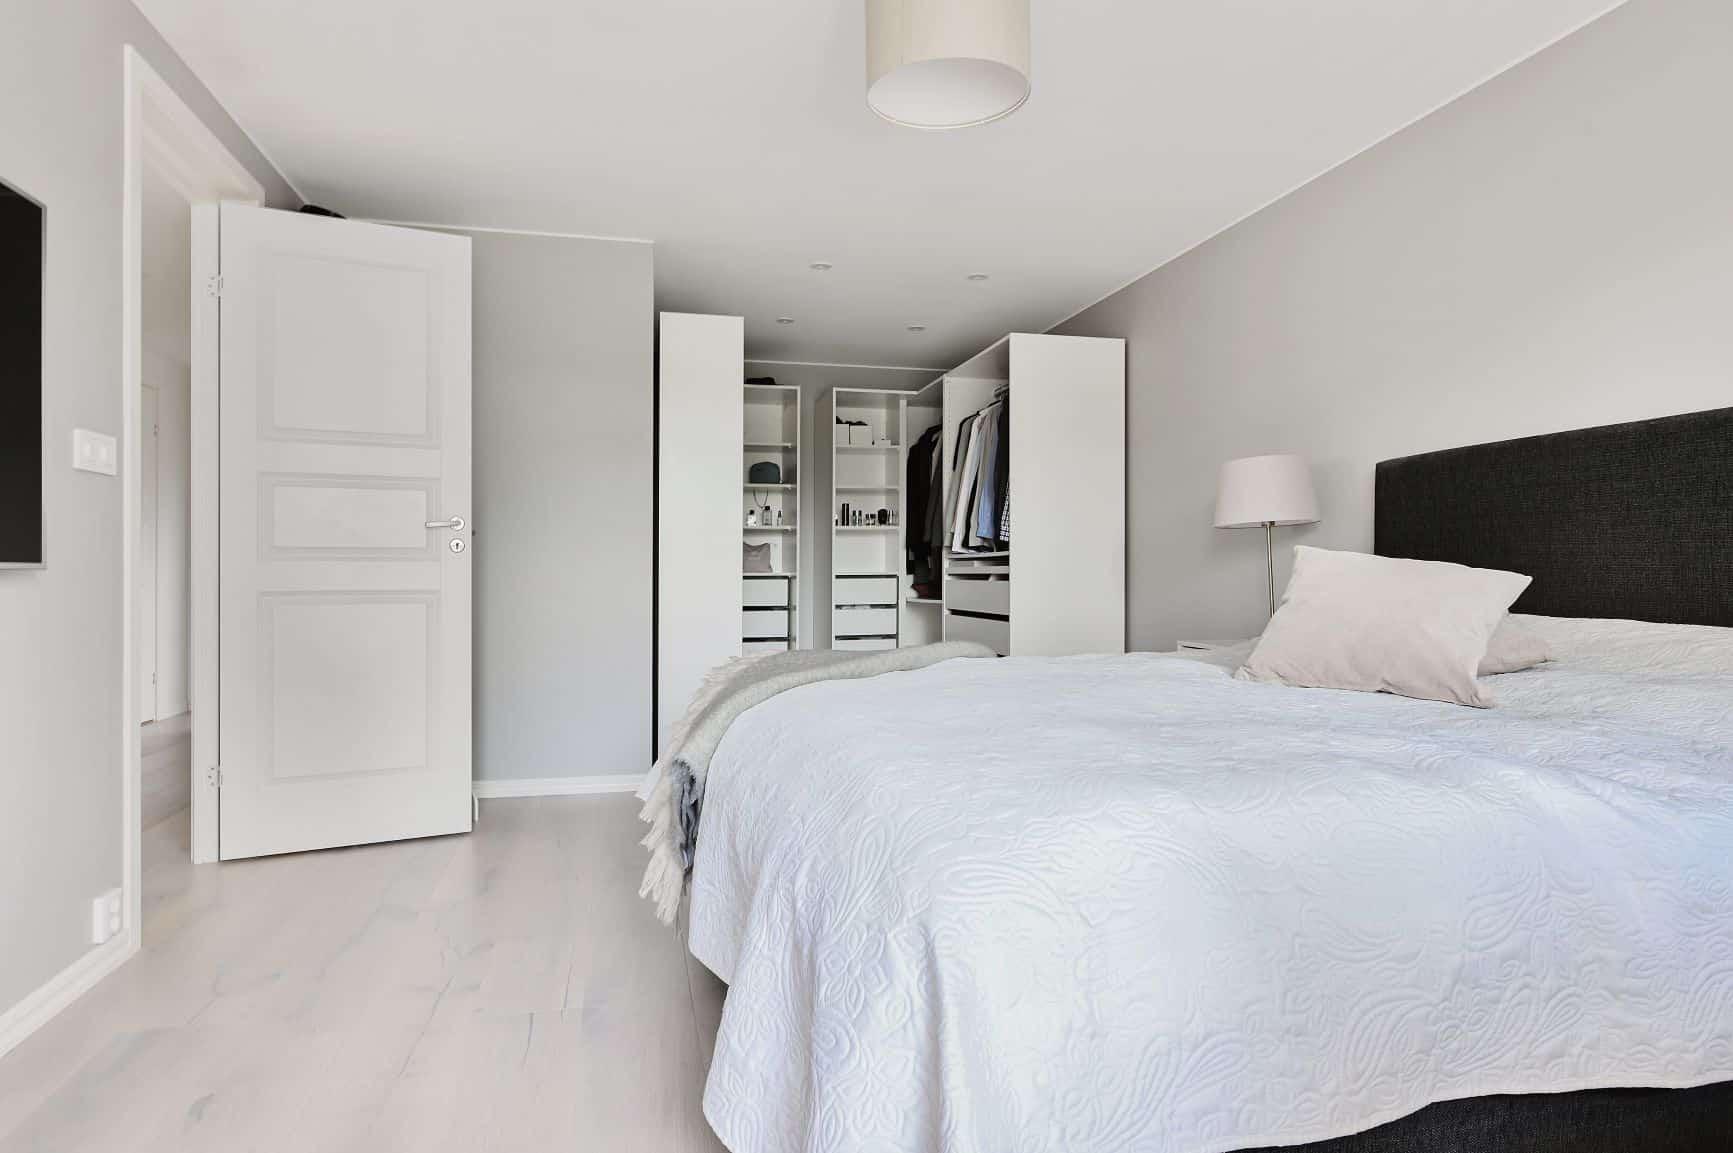 "Referensjobb ""Renovering av sovrum."" utfört av Xp Bygg AB"